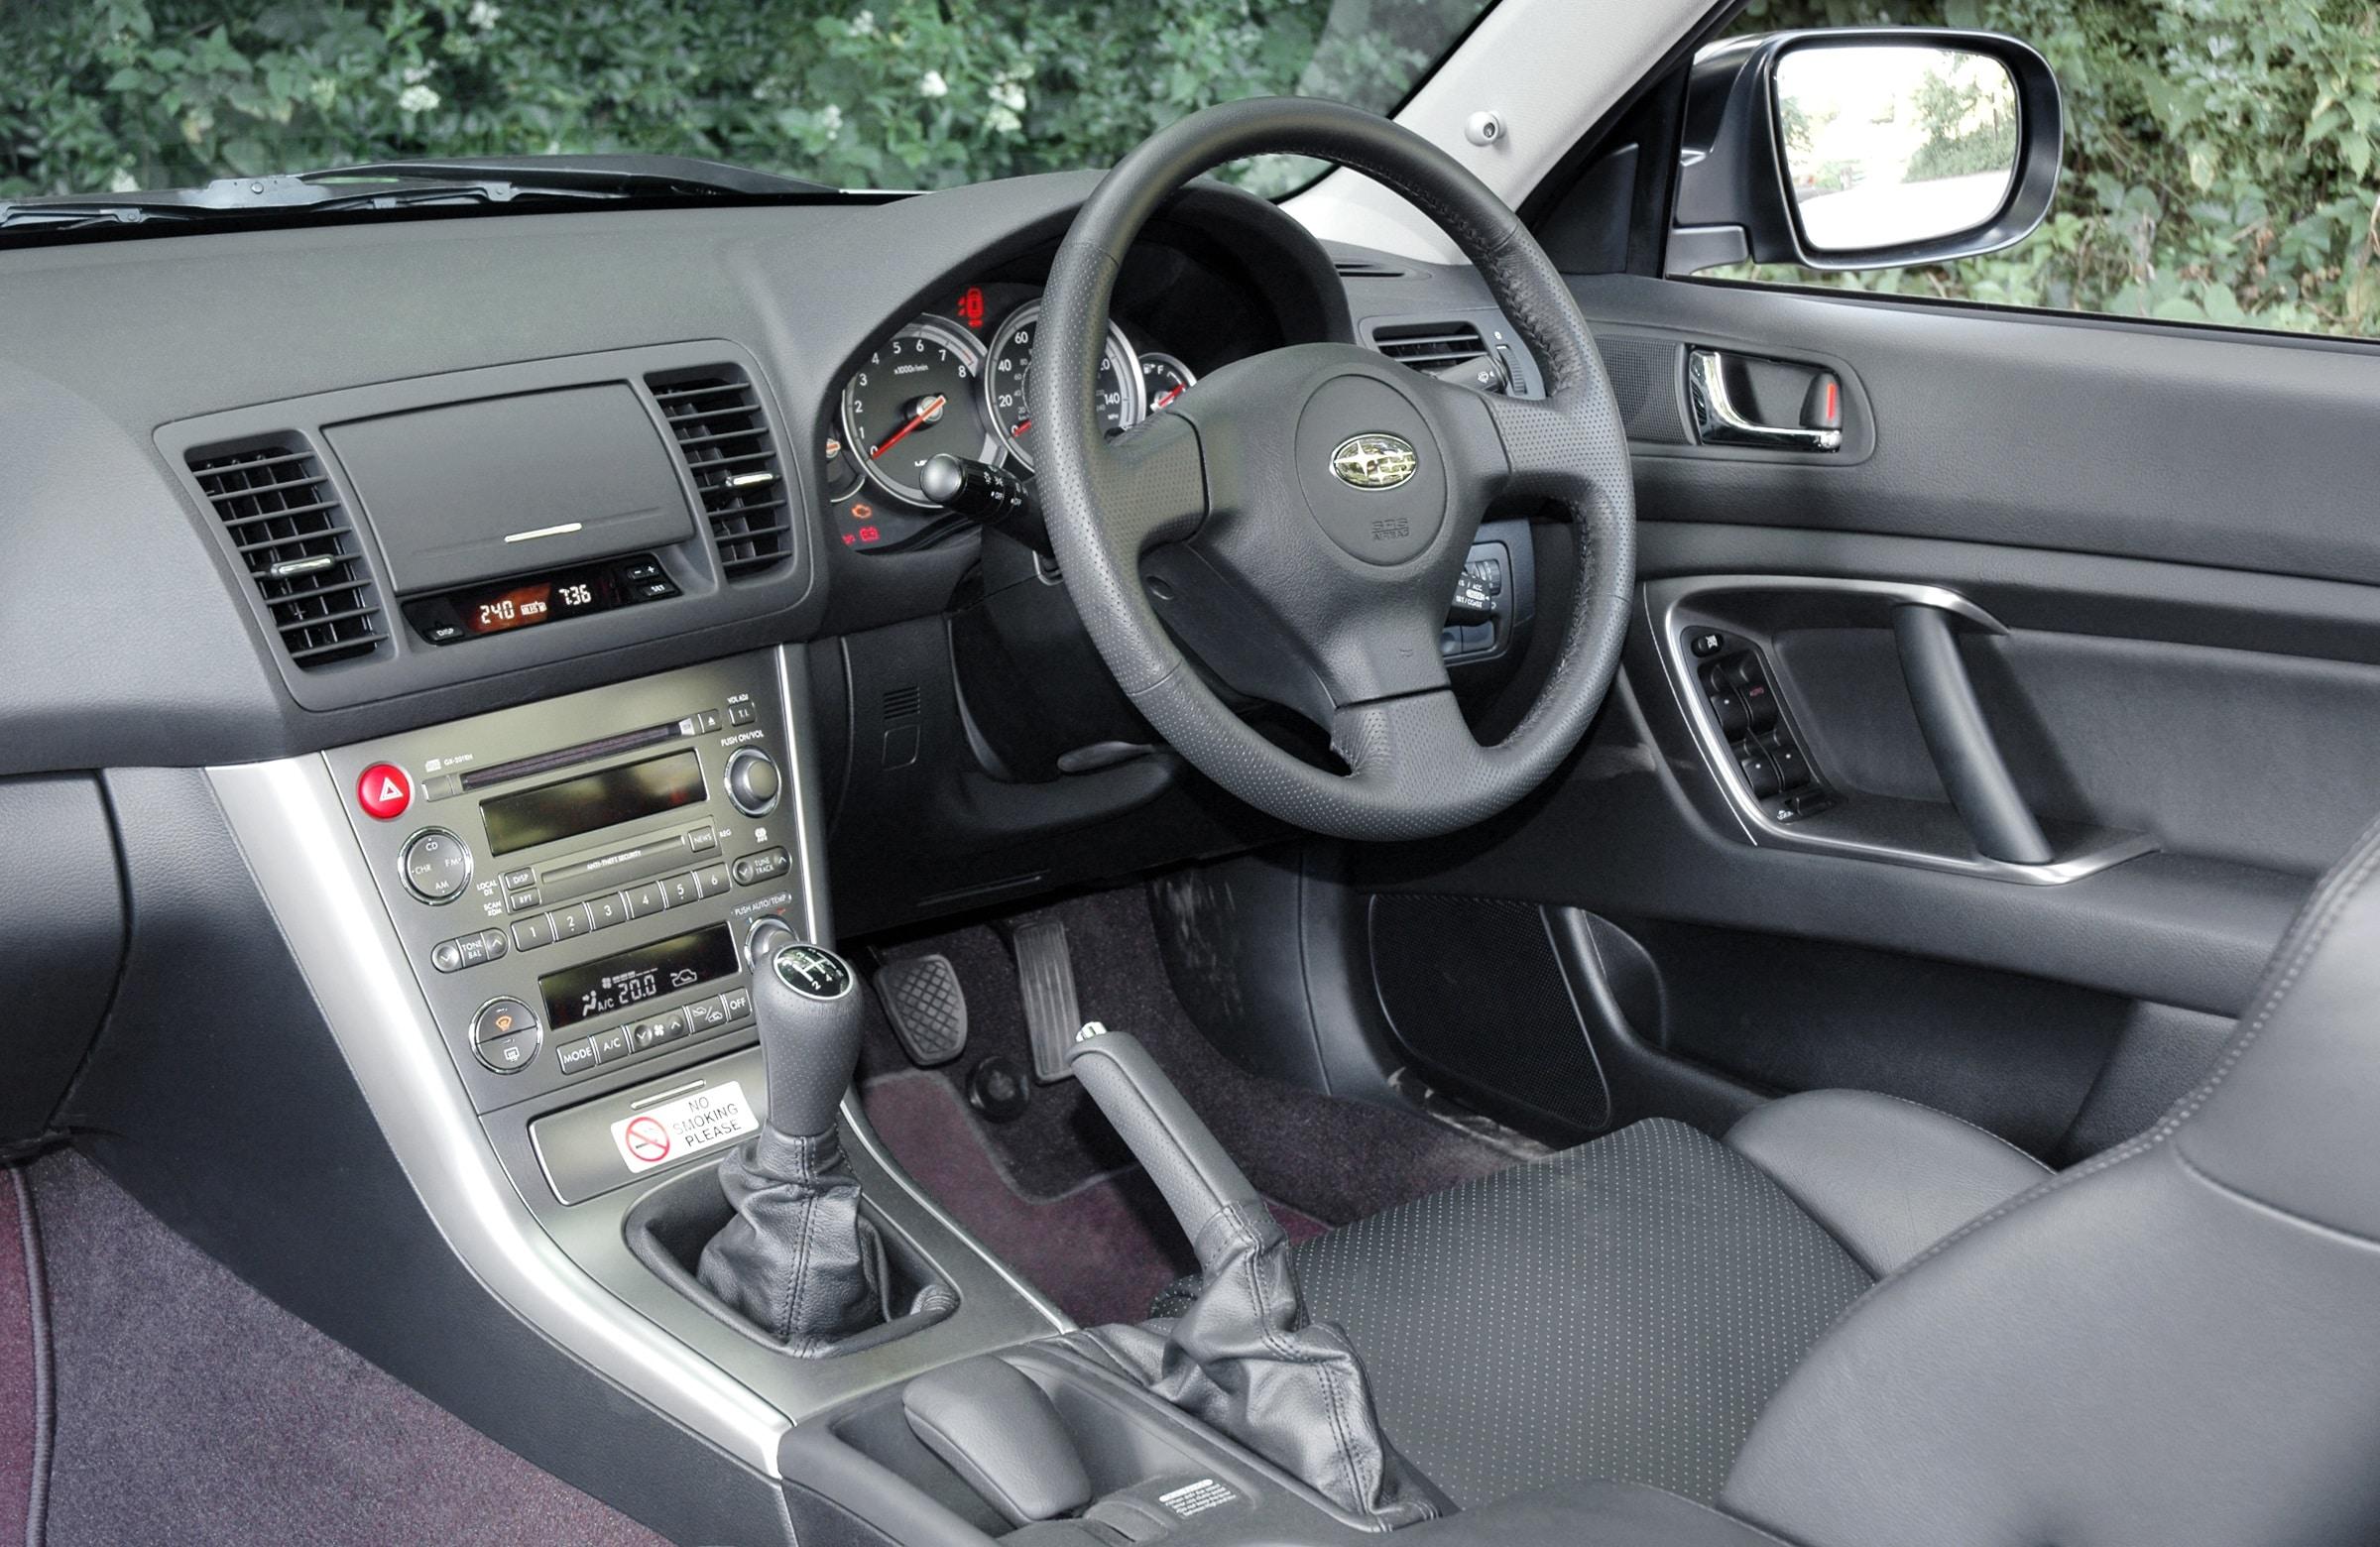 Subaru Legacy, Subaru, Legacy, four-wheel drive, 4x4, estate car, estate, Japanese car, bargain car, family car, cheap car, motoring, automotive, rally car, Impreza, Subaru Impreza, Subaru Forester, Forester, autotrader, ebay, ebay motors, car, cars, car sales